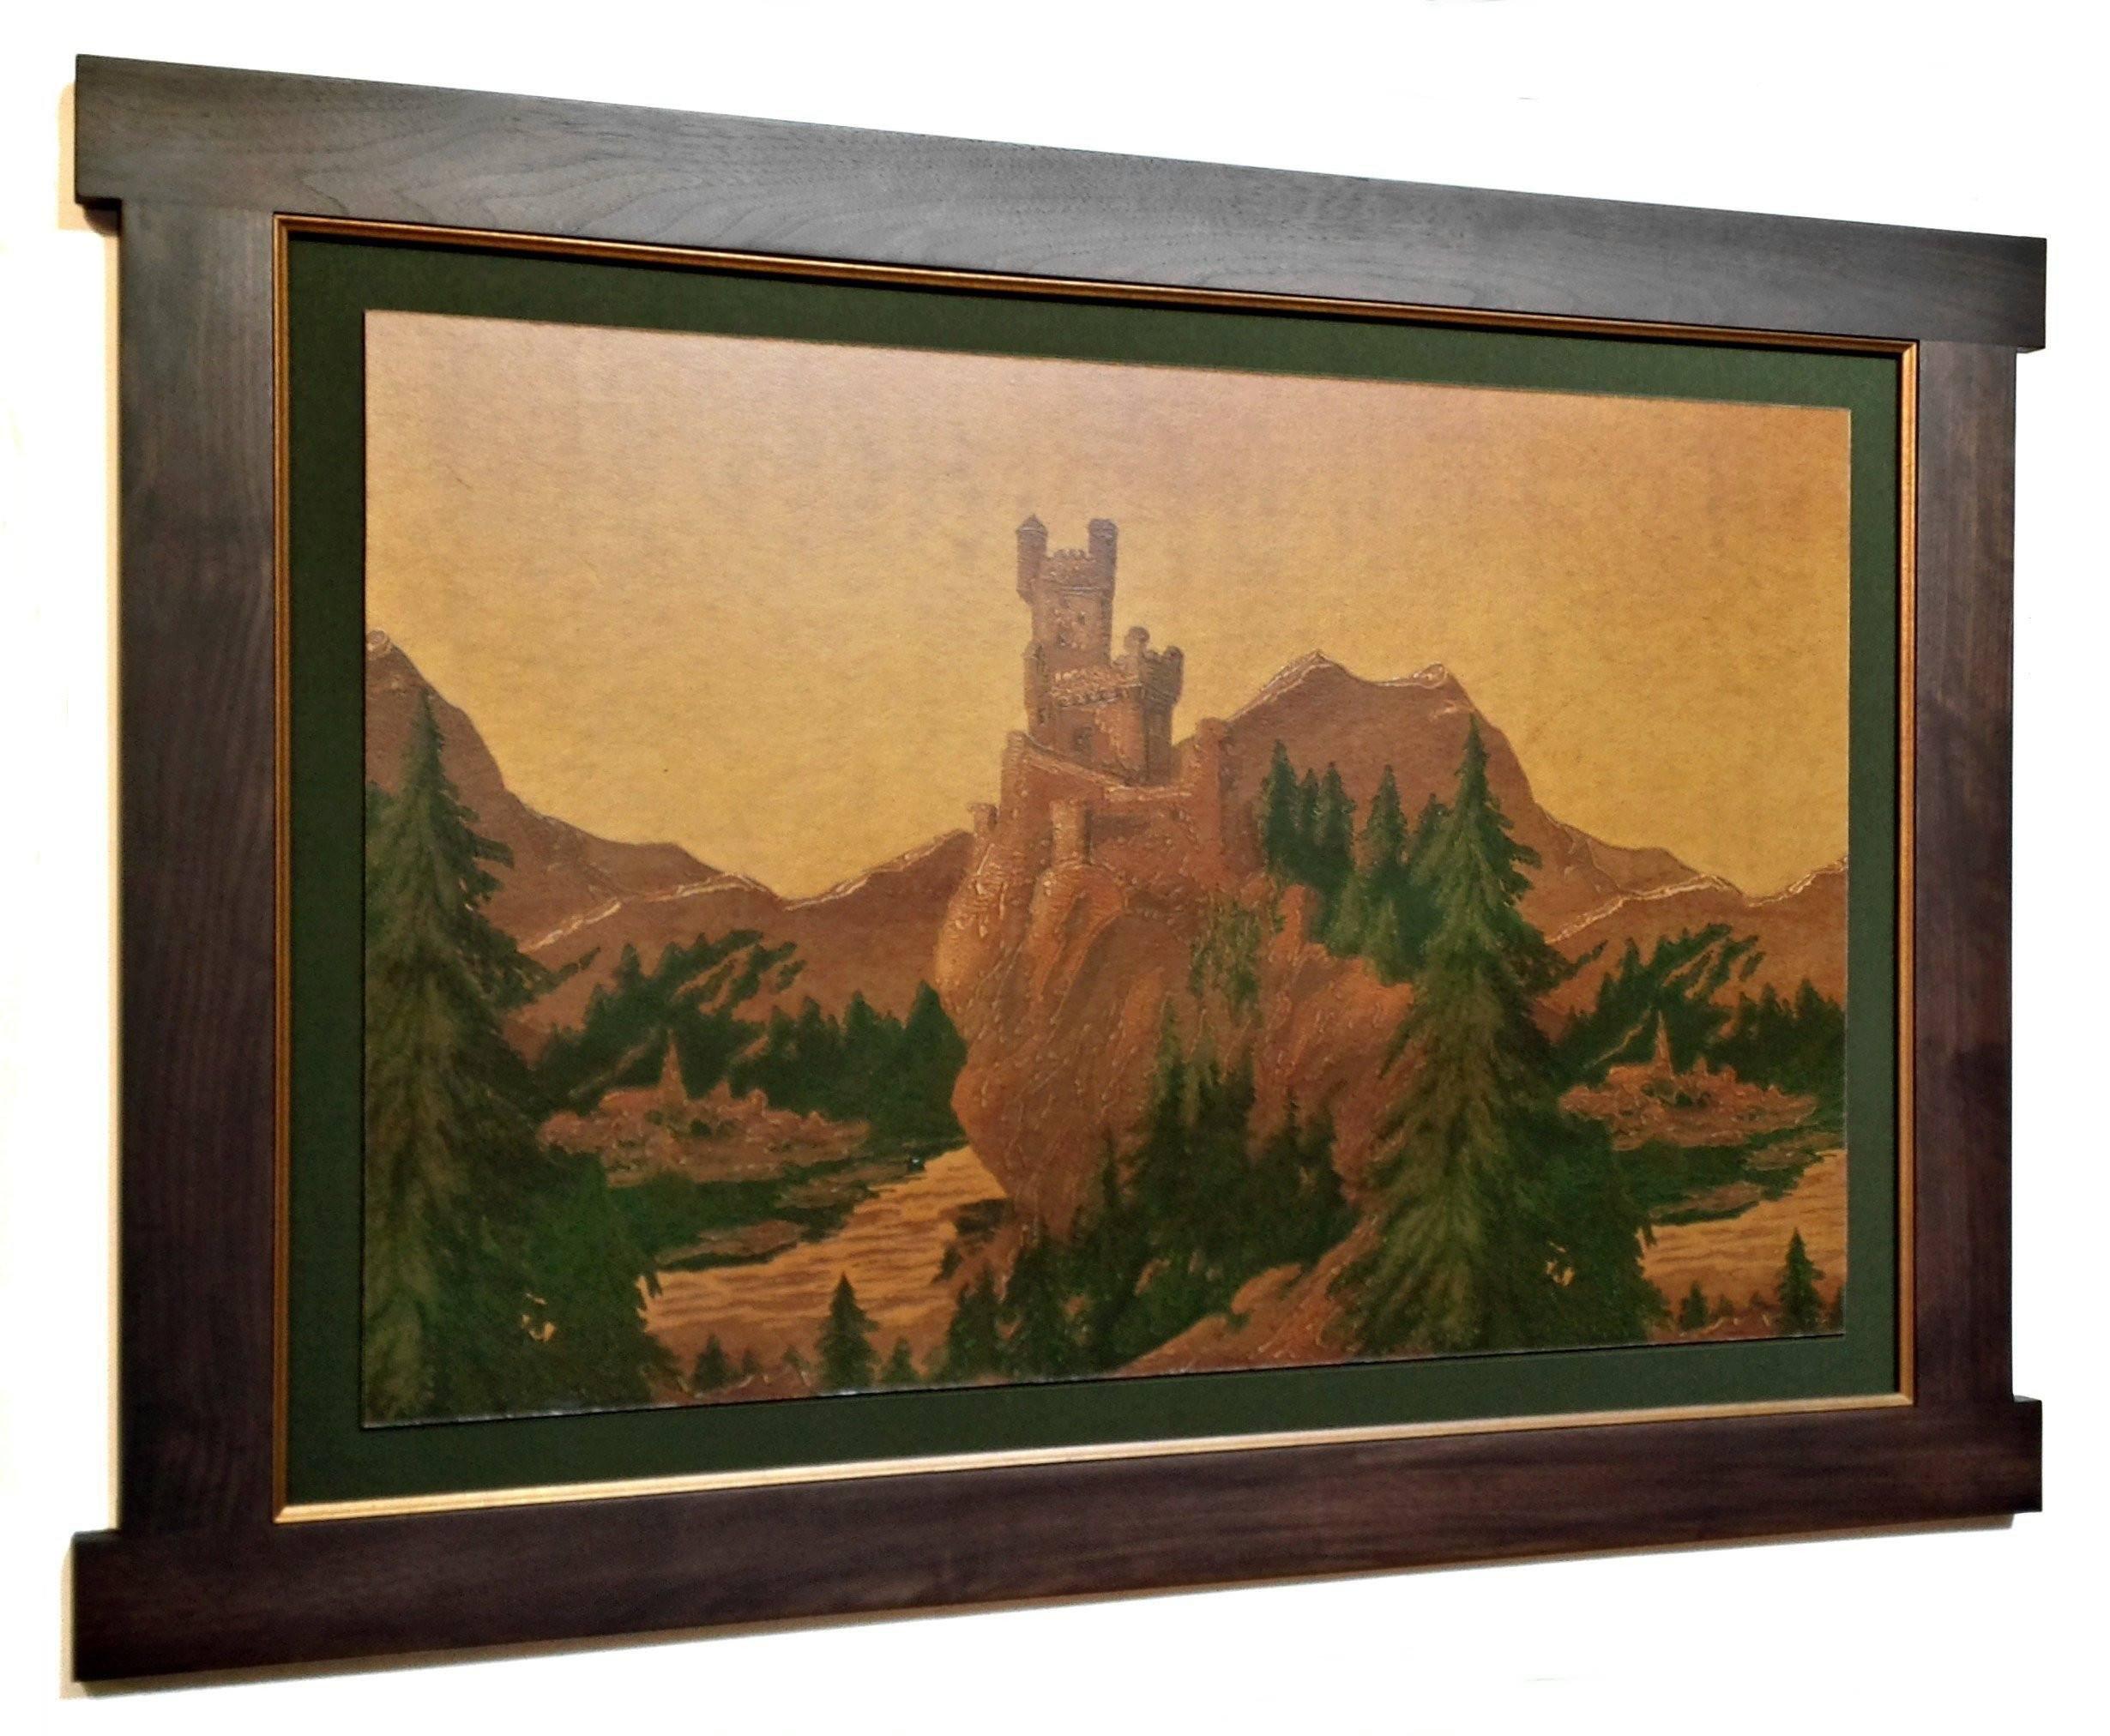 The Rhine Castles Frieze on GoldAntique WallpaperWall Art 2460x2024